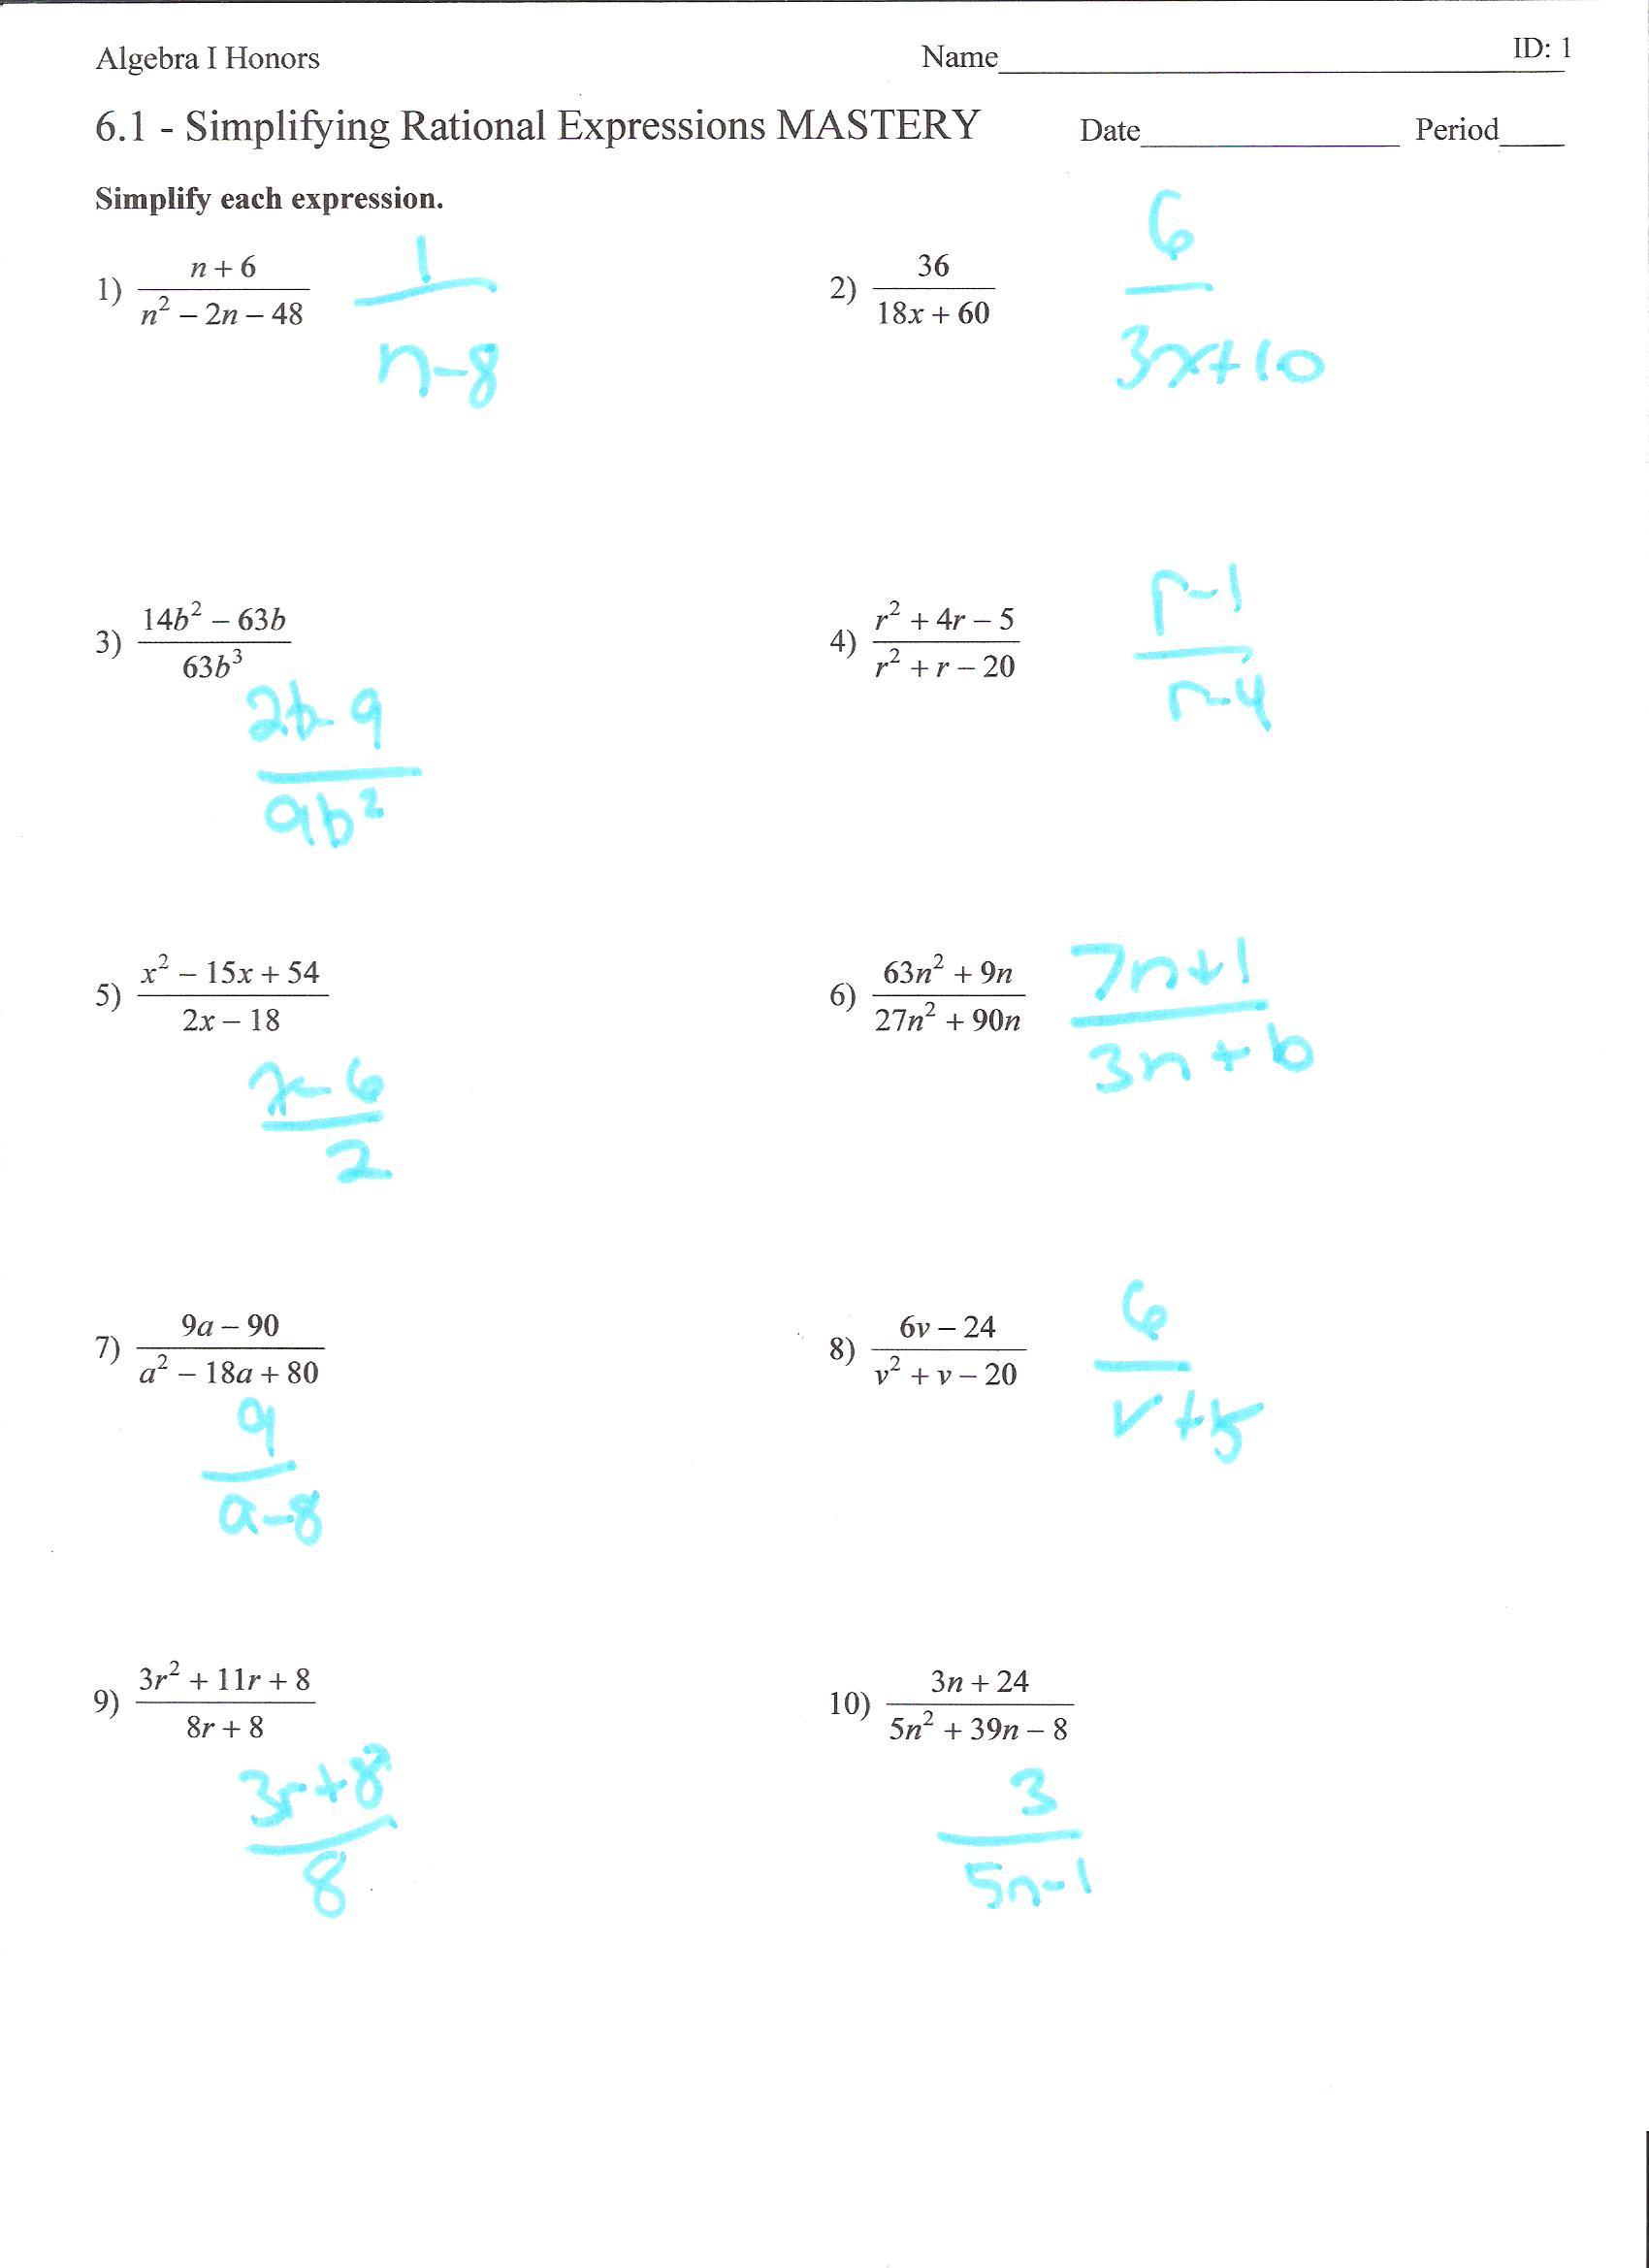 Simplifying Complex Fractions Worksheet Simplifying Rational Expressions Worksheet Algebra 2